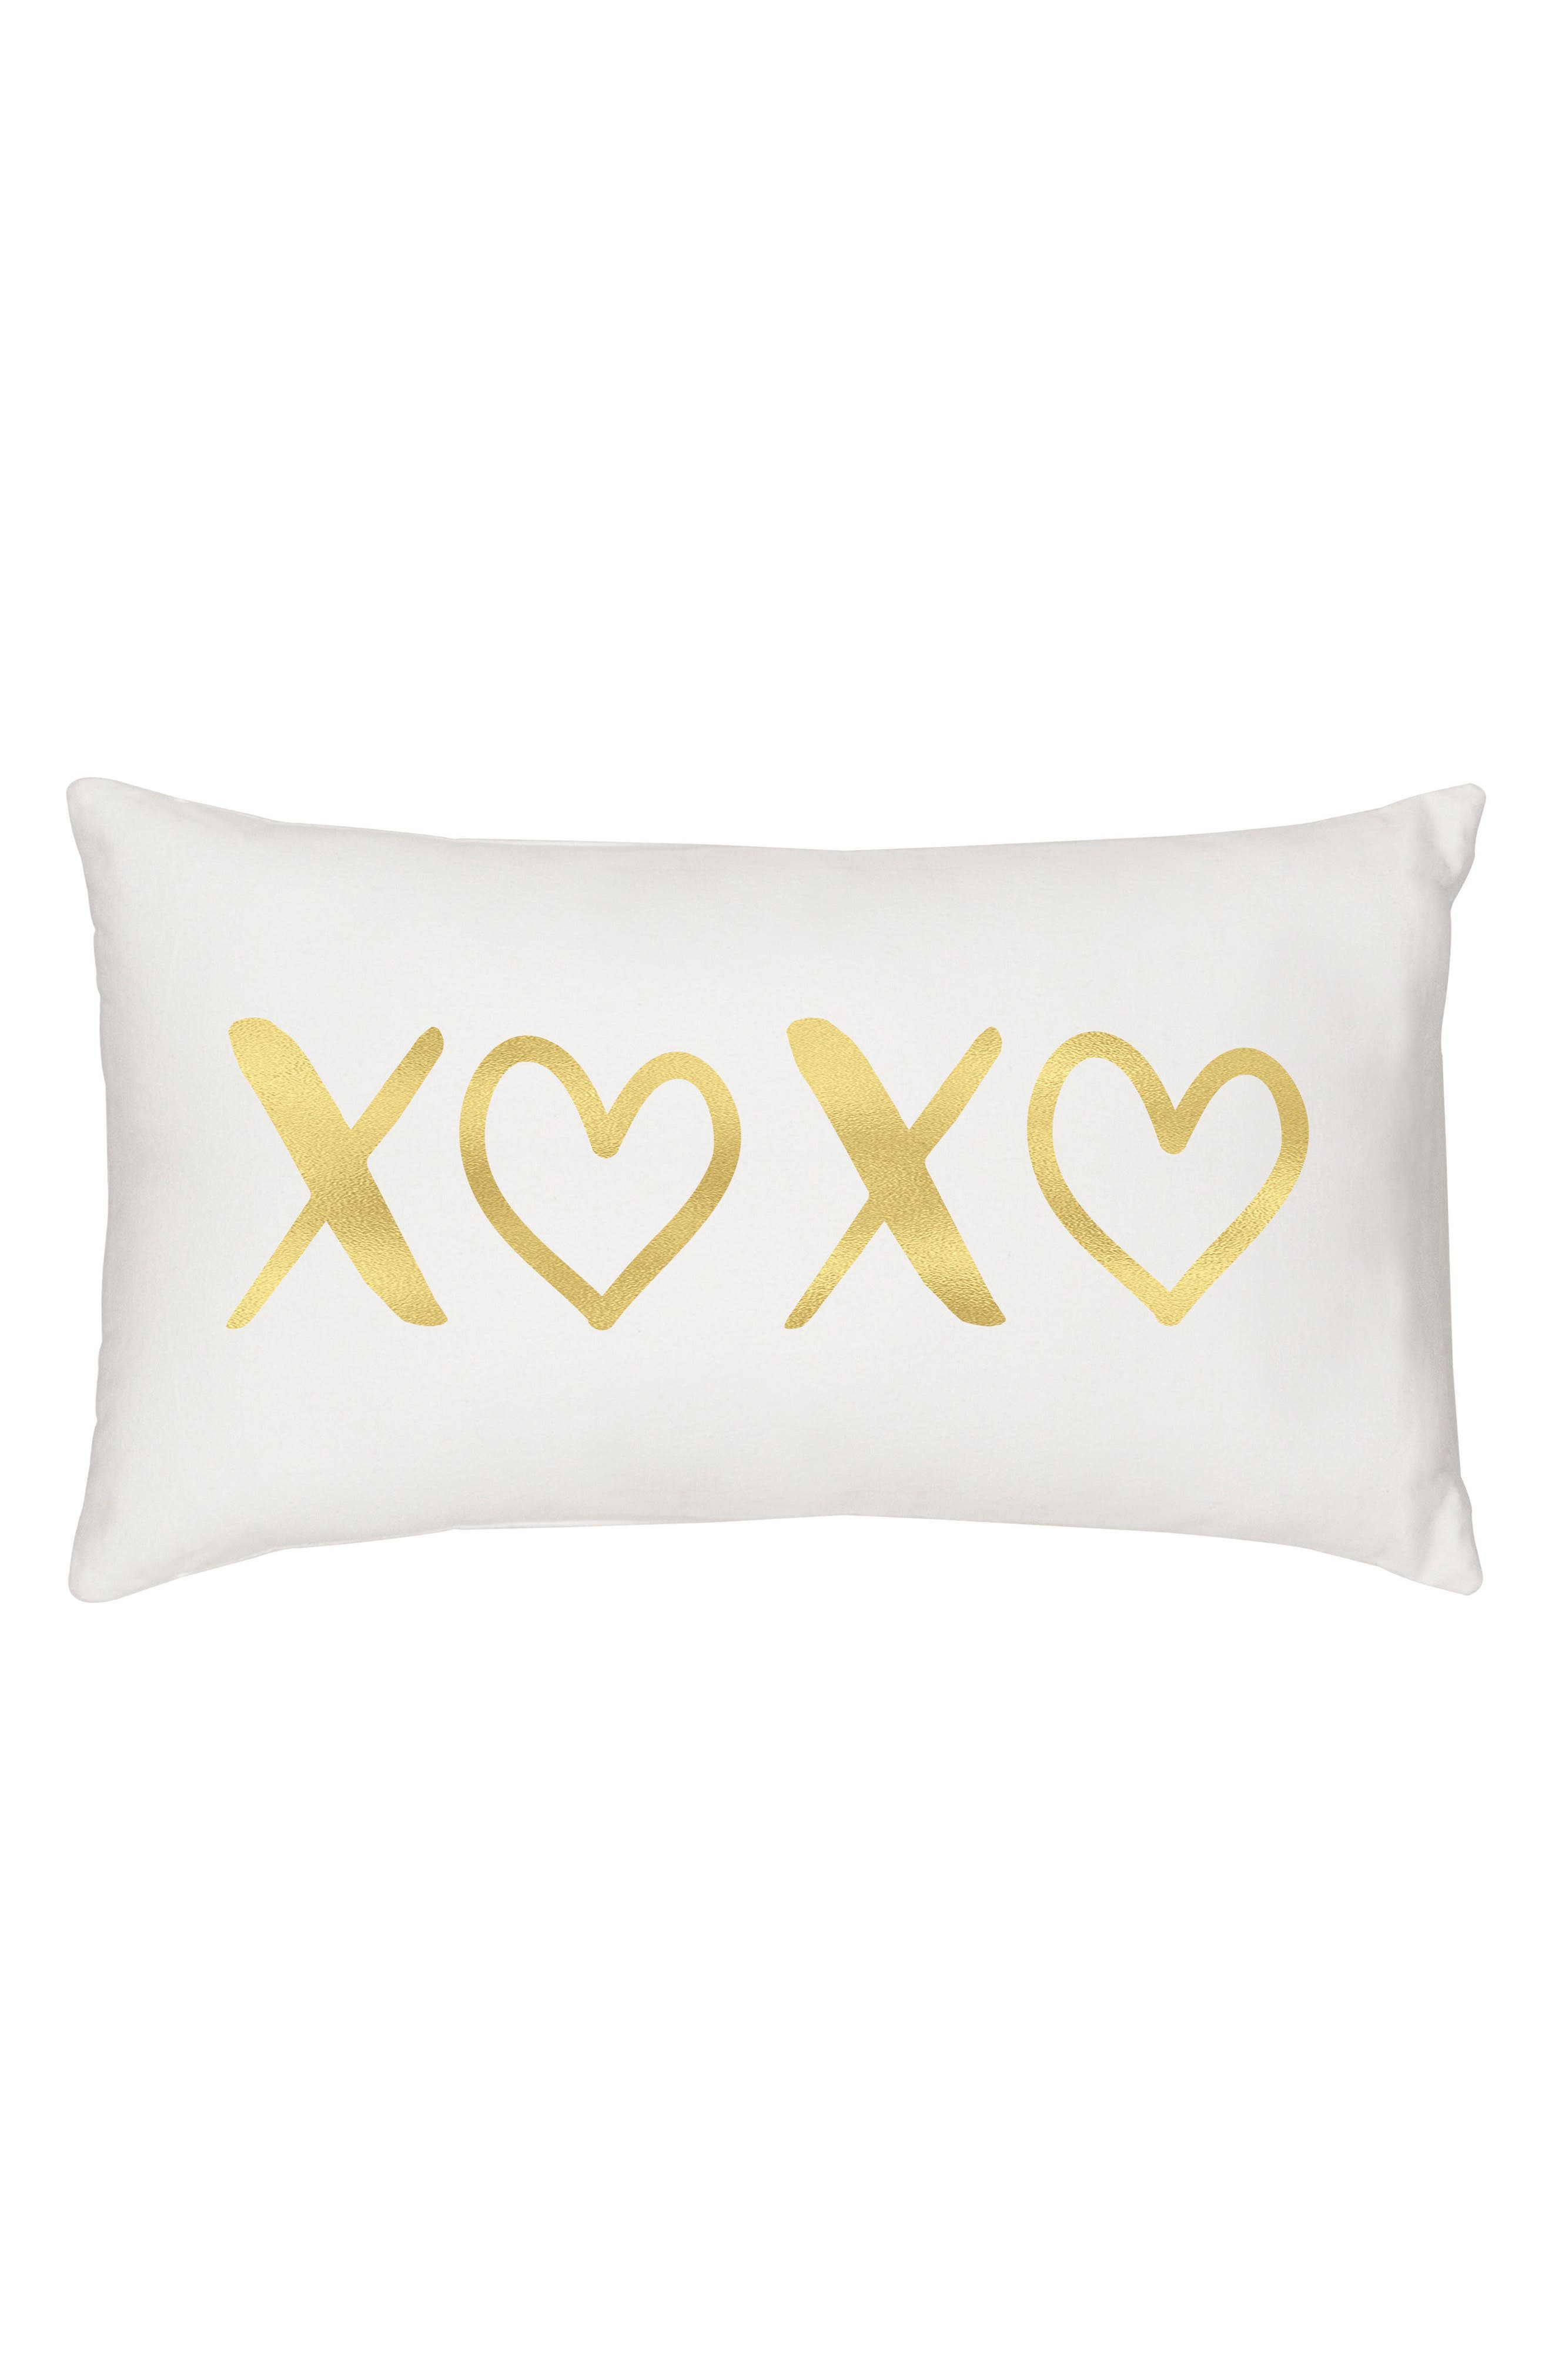 XOXO Accent Pillow,                             Main thumbnail 1, color,                             Gold